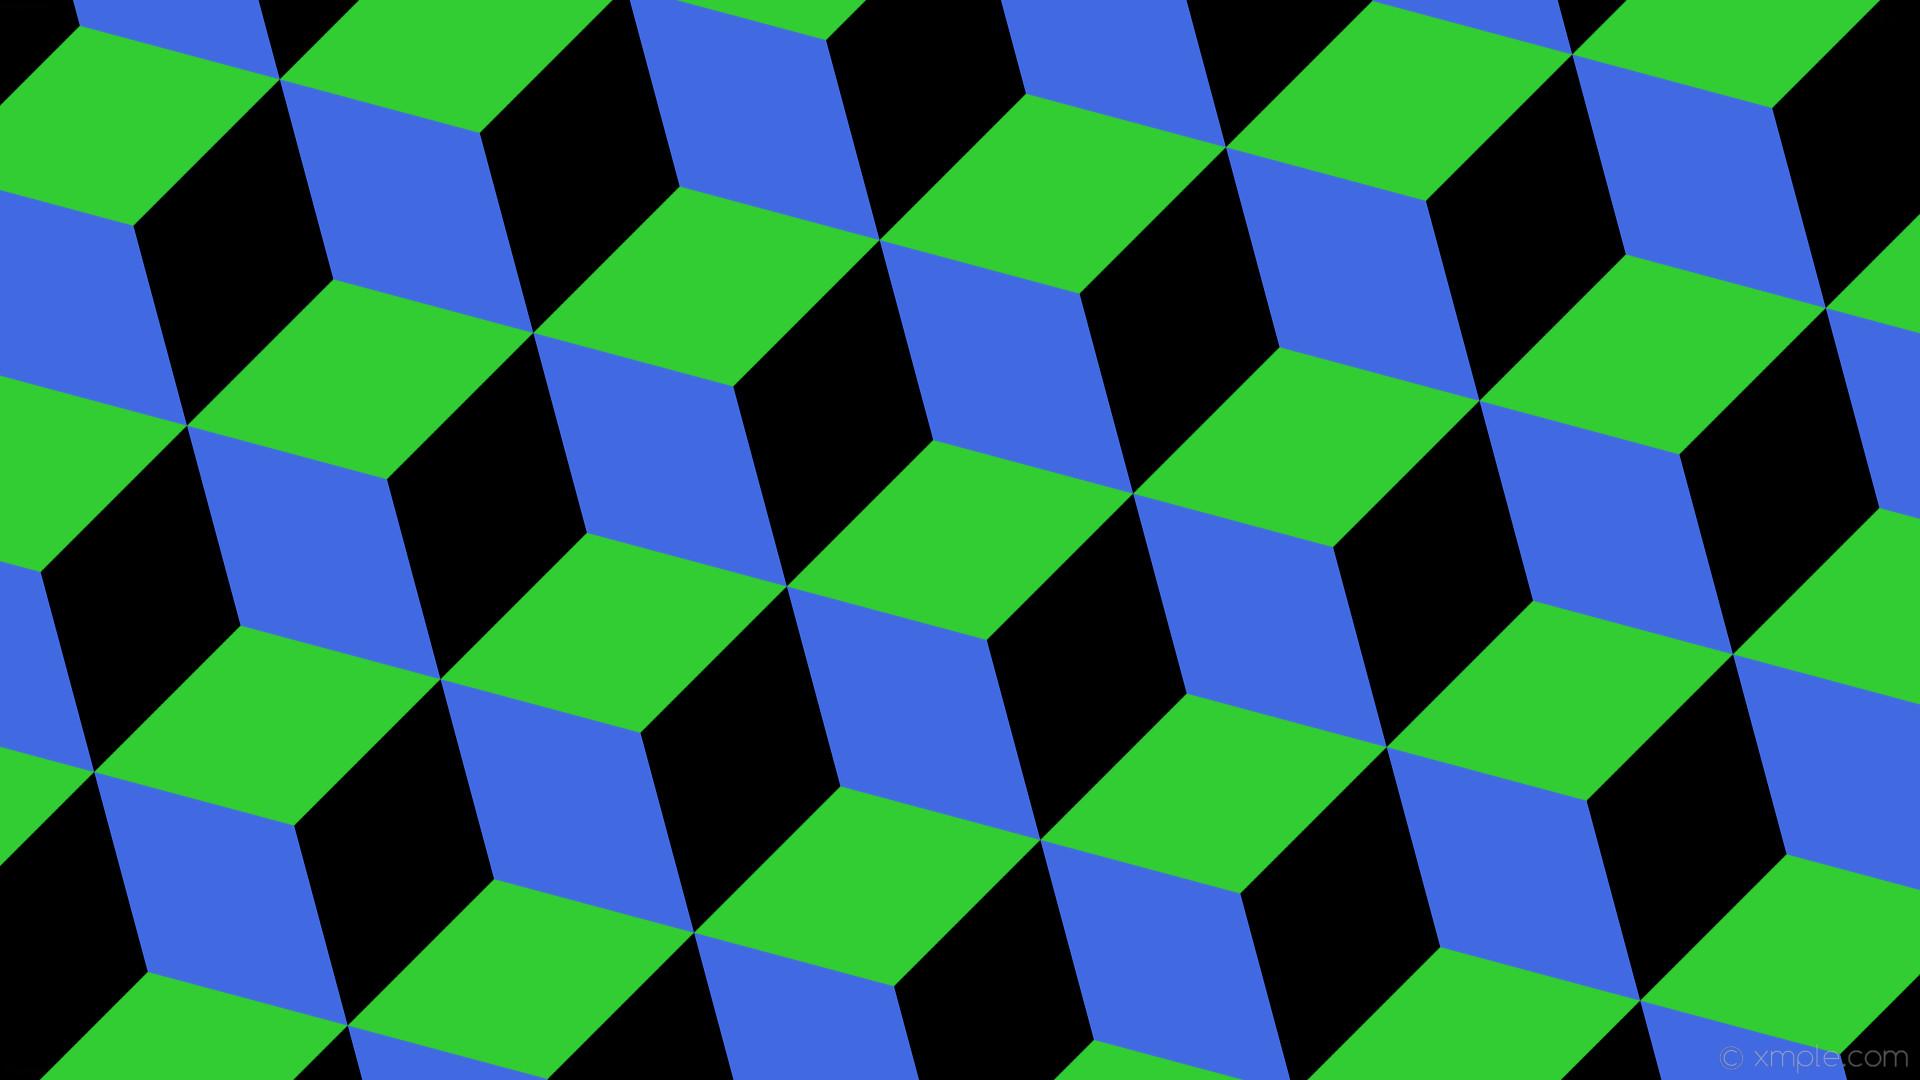 wallpaper green blue black 3d cubes lime green royal blue #32cd32 #4169e1  #000000